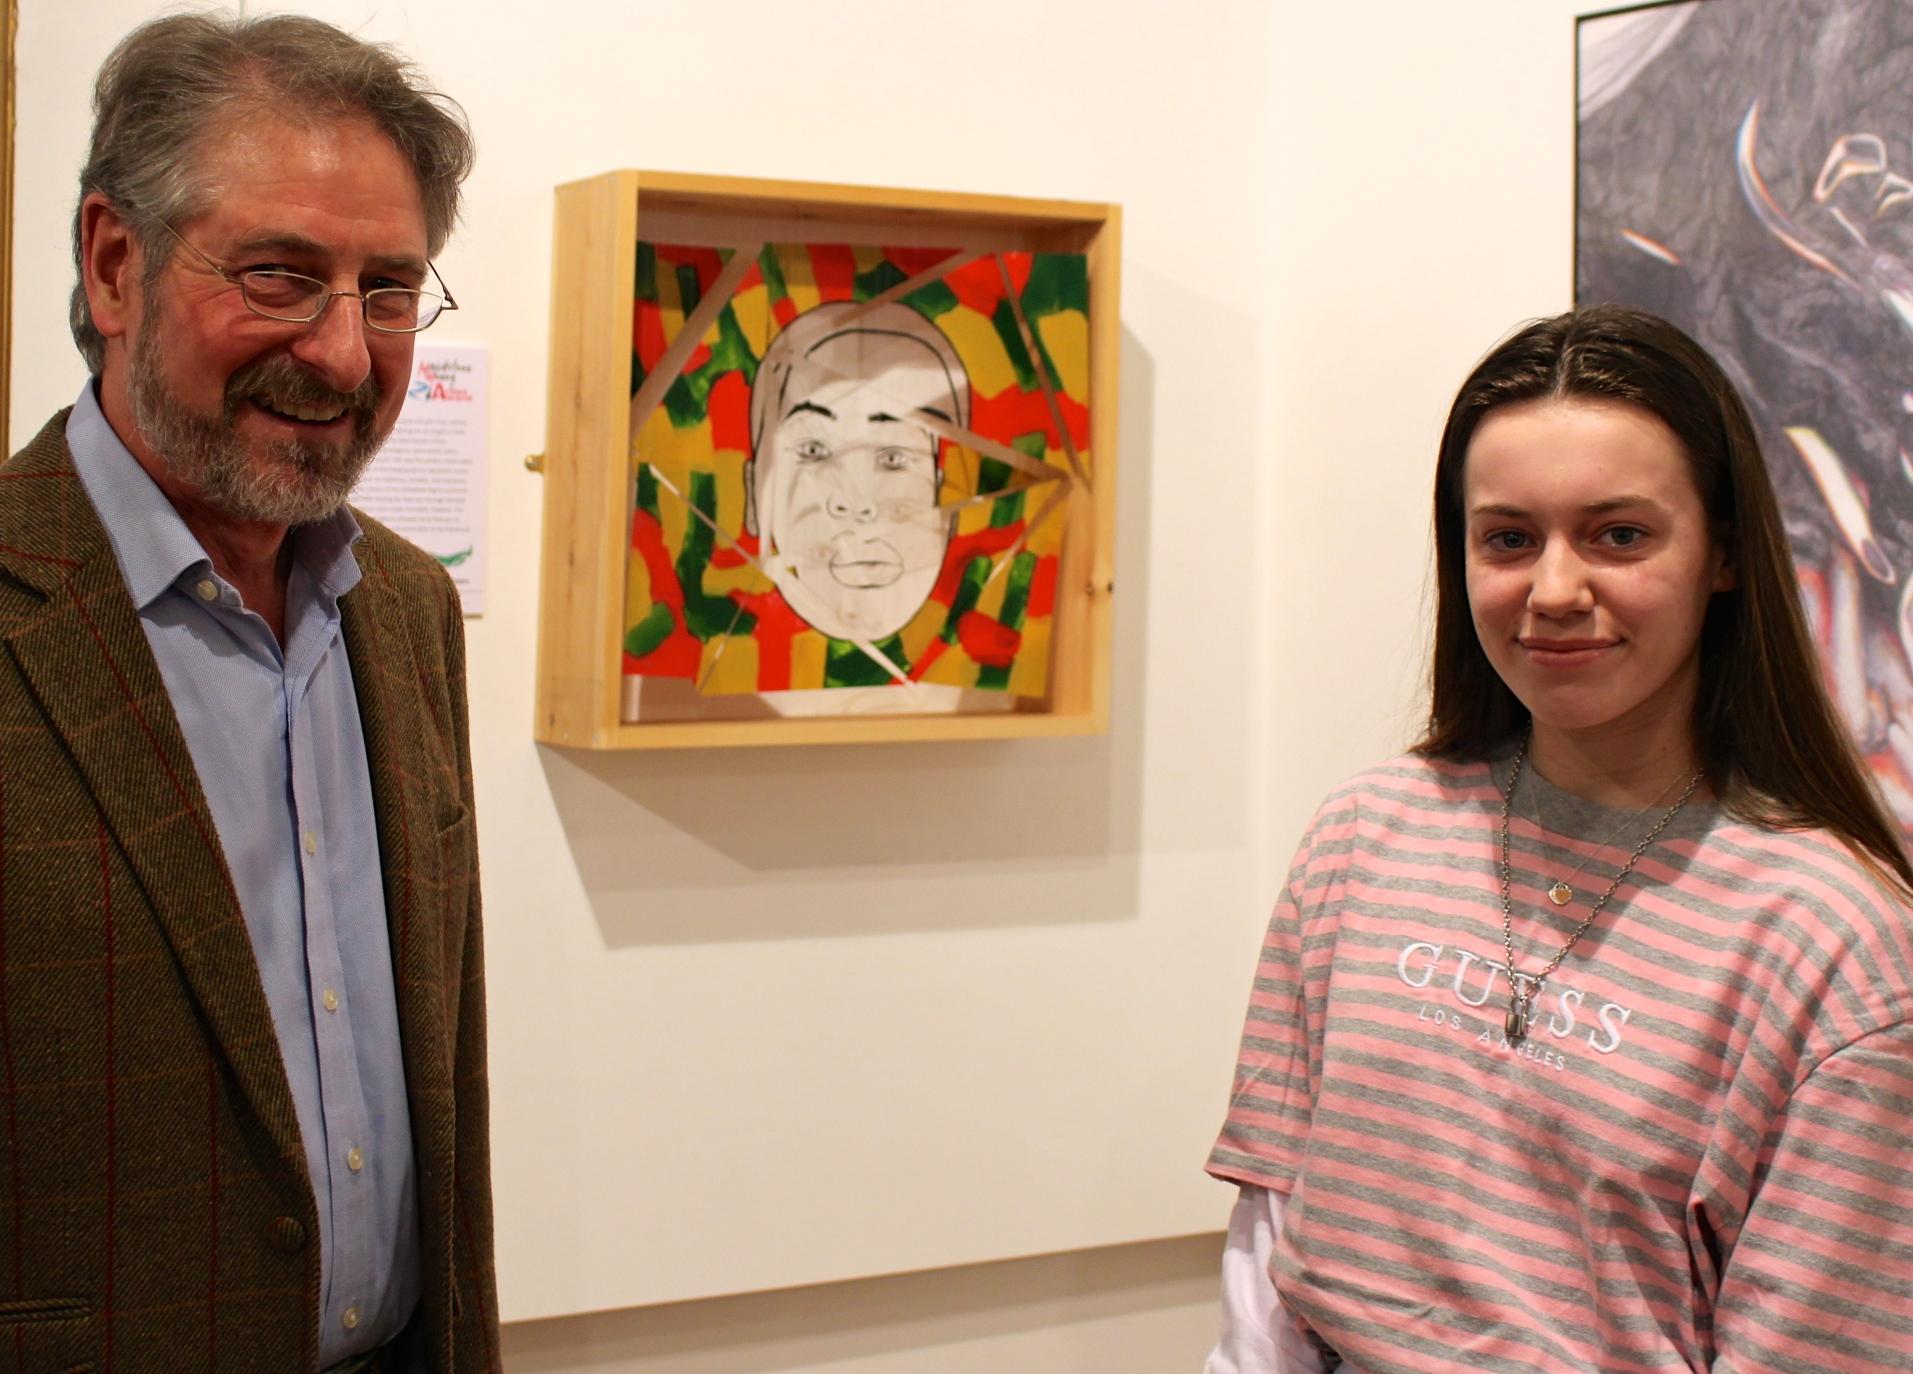 Maidstone Young Artist Award 2019 Winner Rose Watson